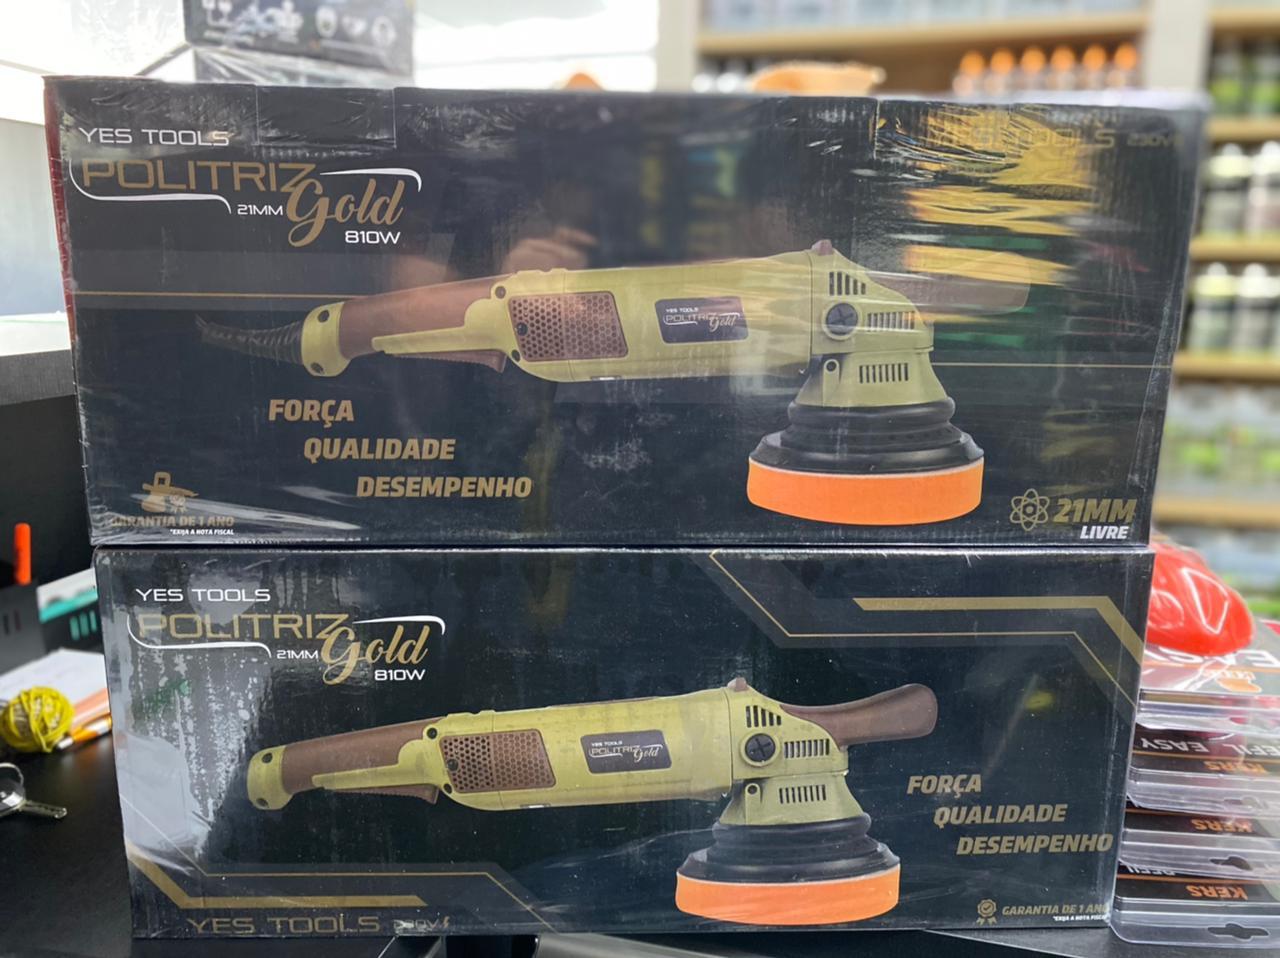 Politriz Roto Orbital 21mm Gold Yes Tools 810W 230V - Kers